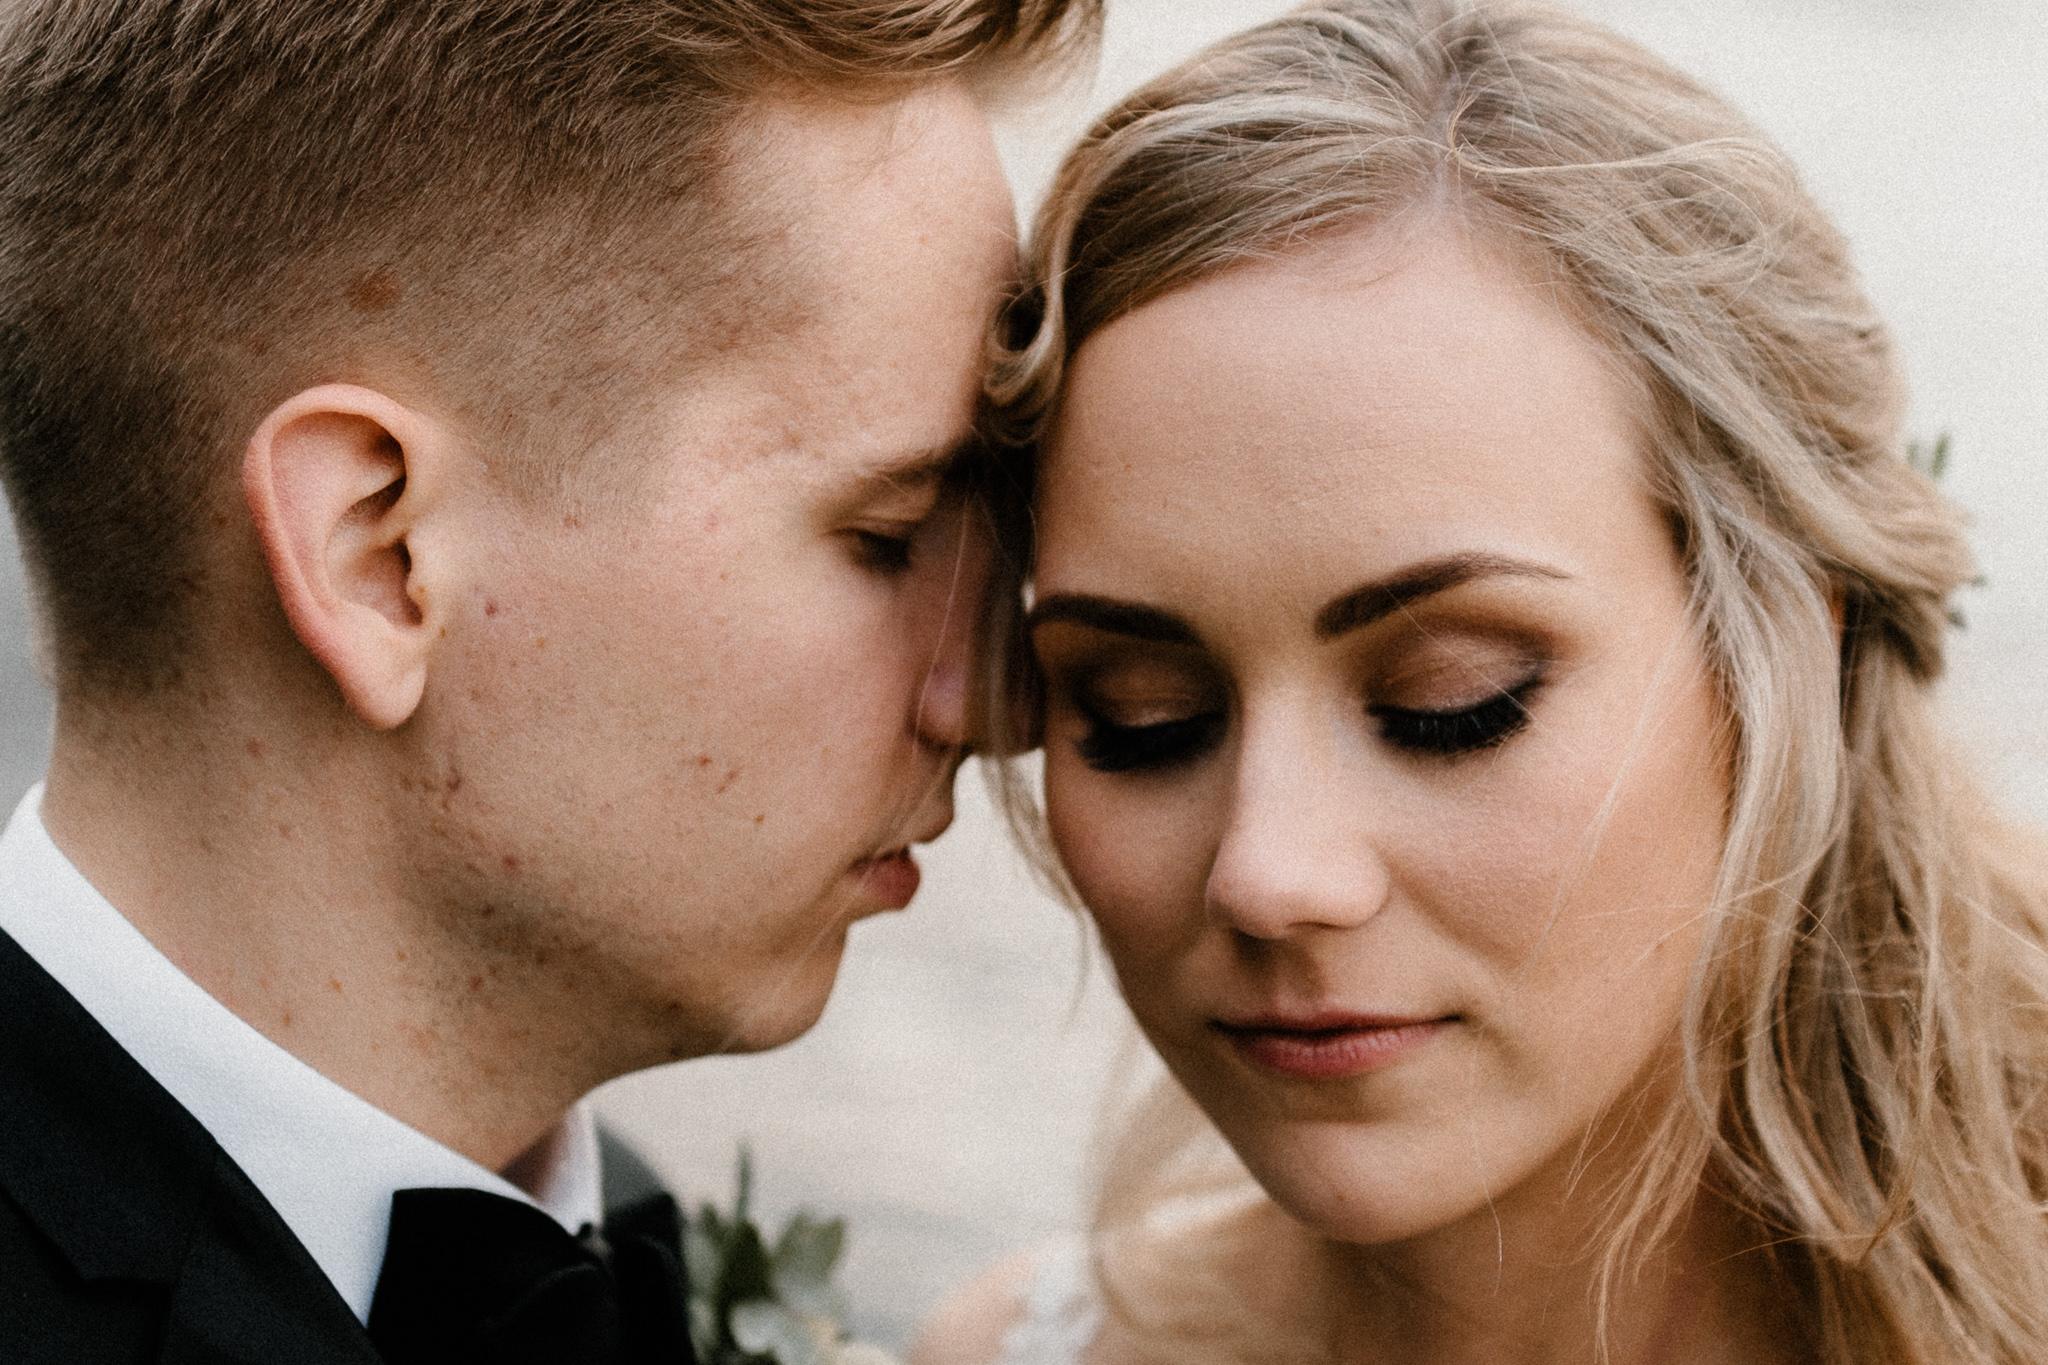 Johanna + Mikko - Tampere - Photo by Patrick Karkkolainen Wedding Photographer-129.jpg